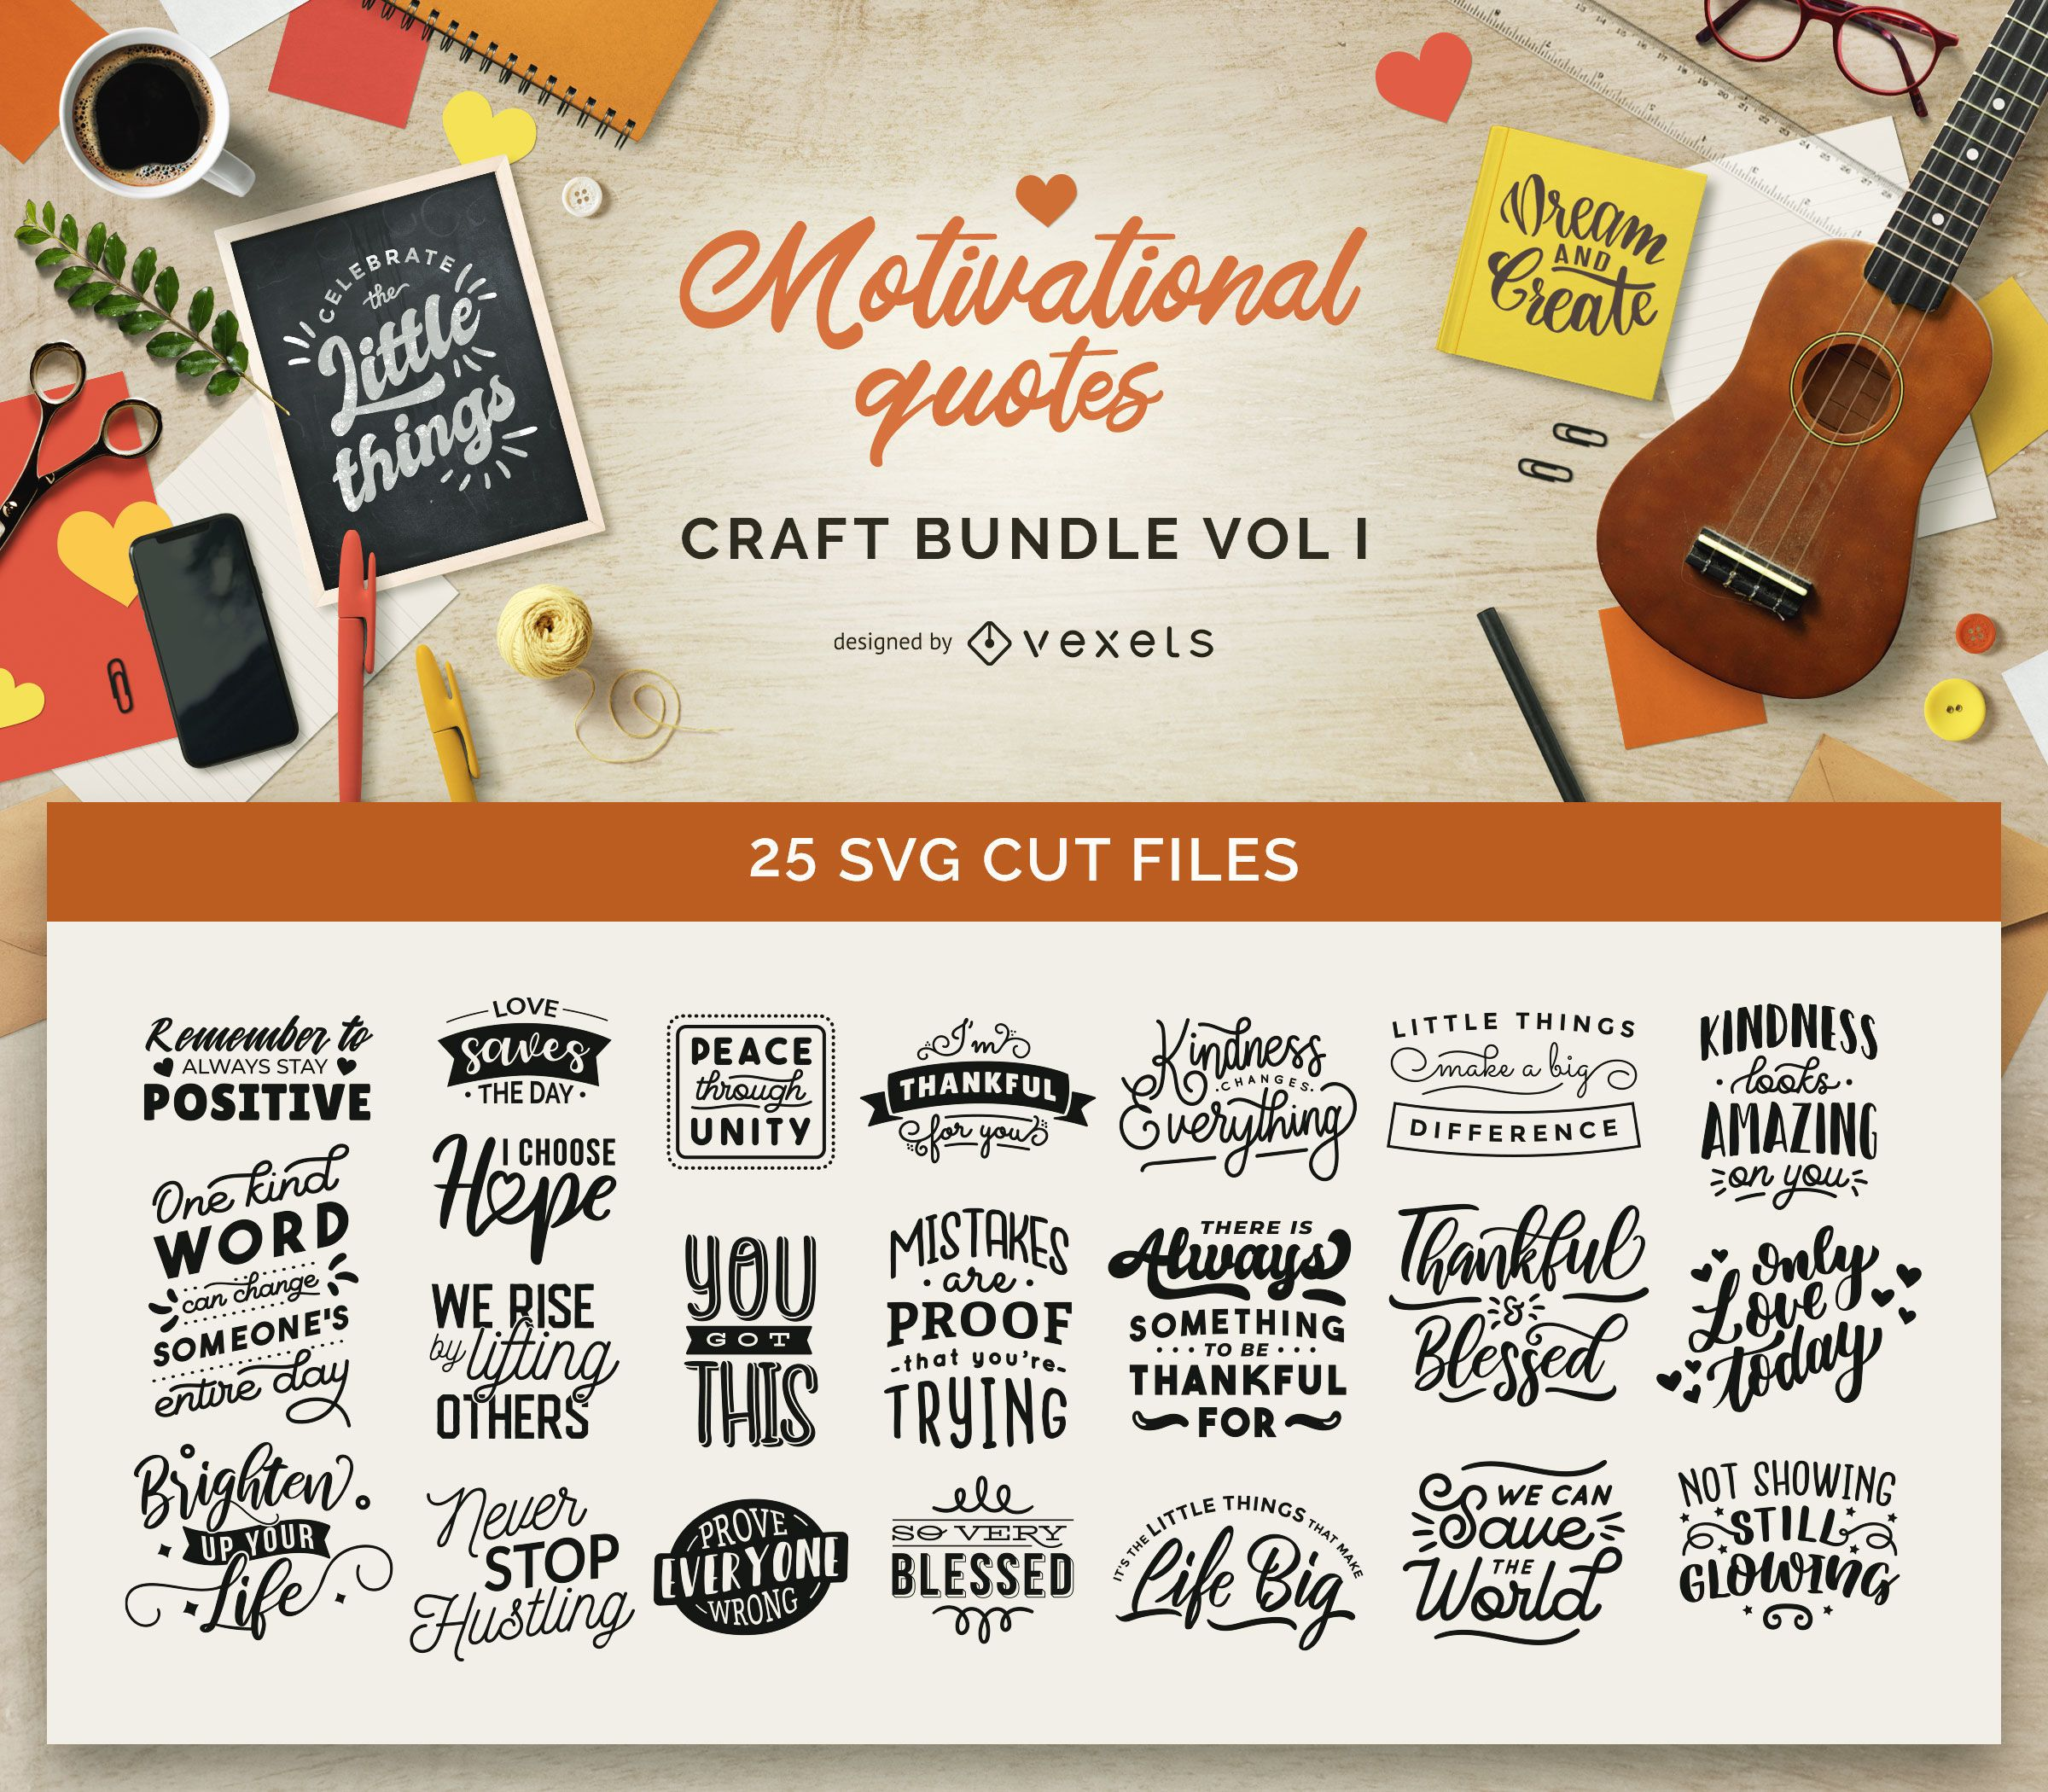 Motivational Quotes Craft Bundle Vol I